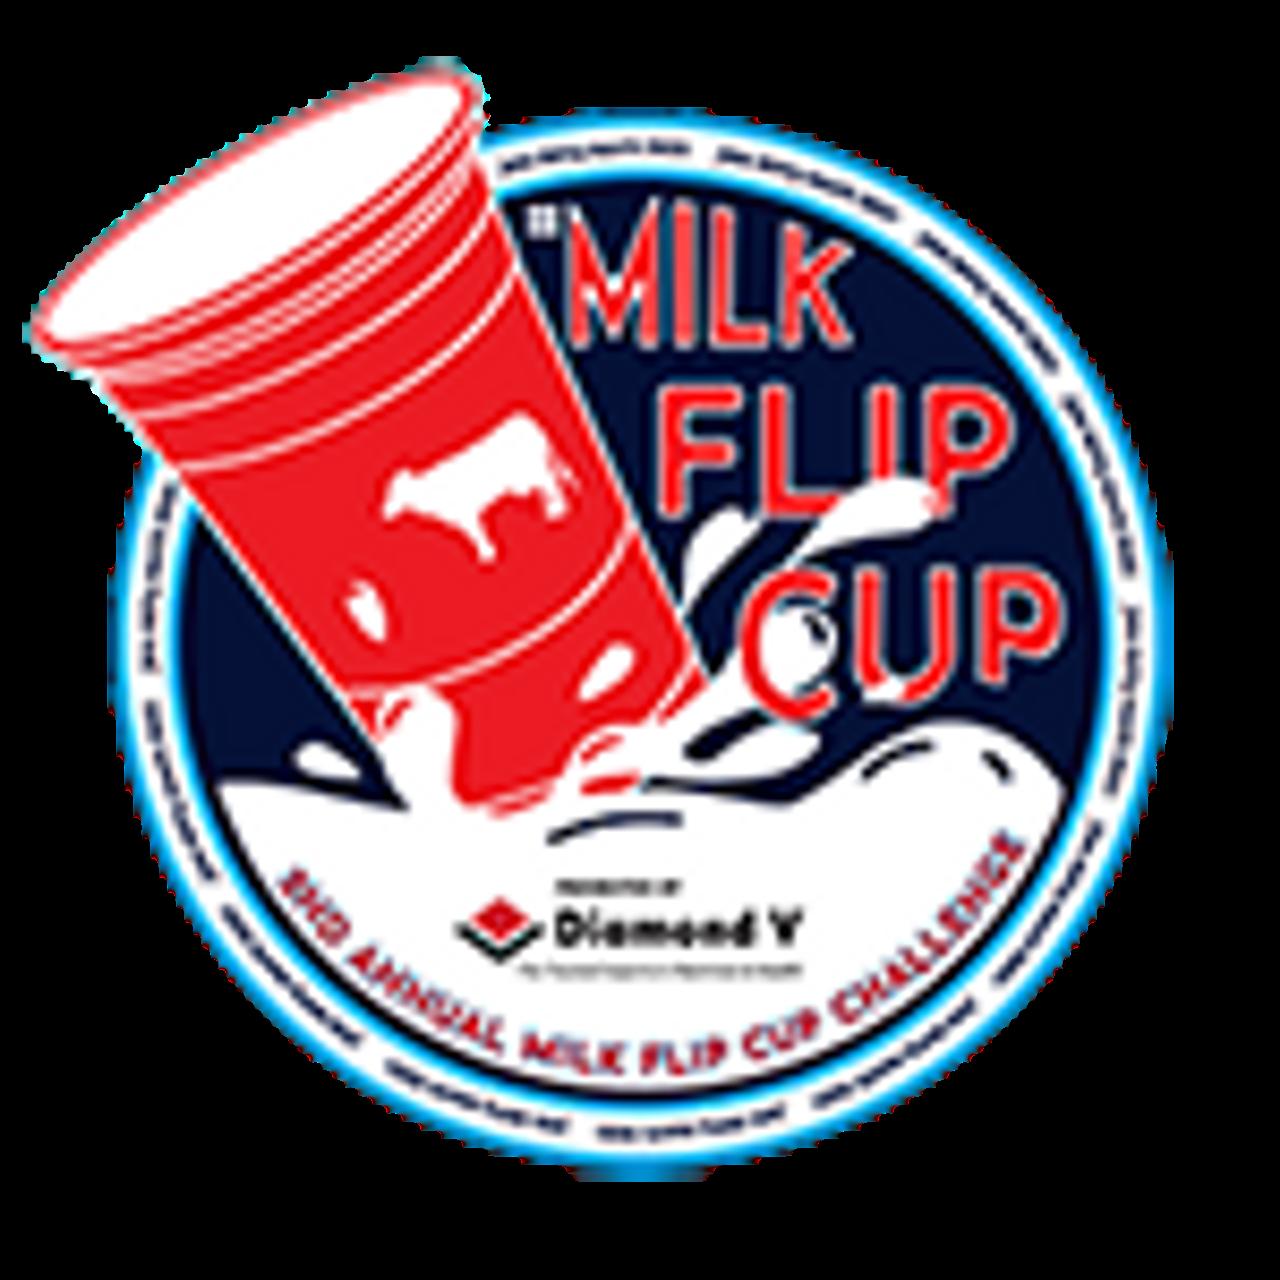 Milk Flip Cup